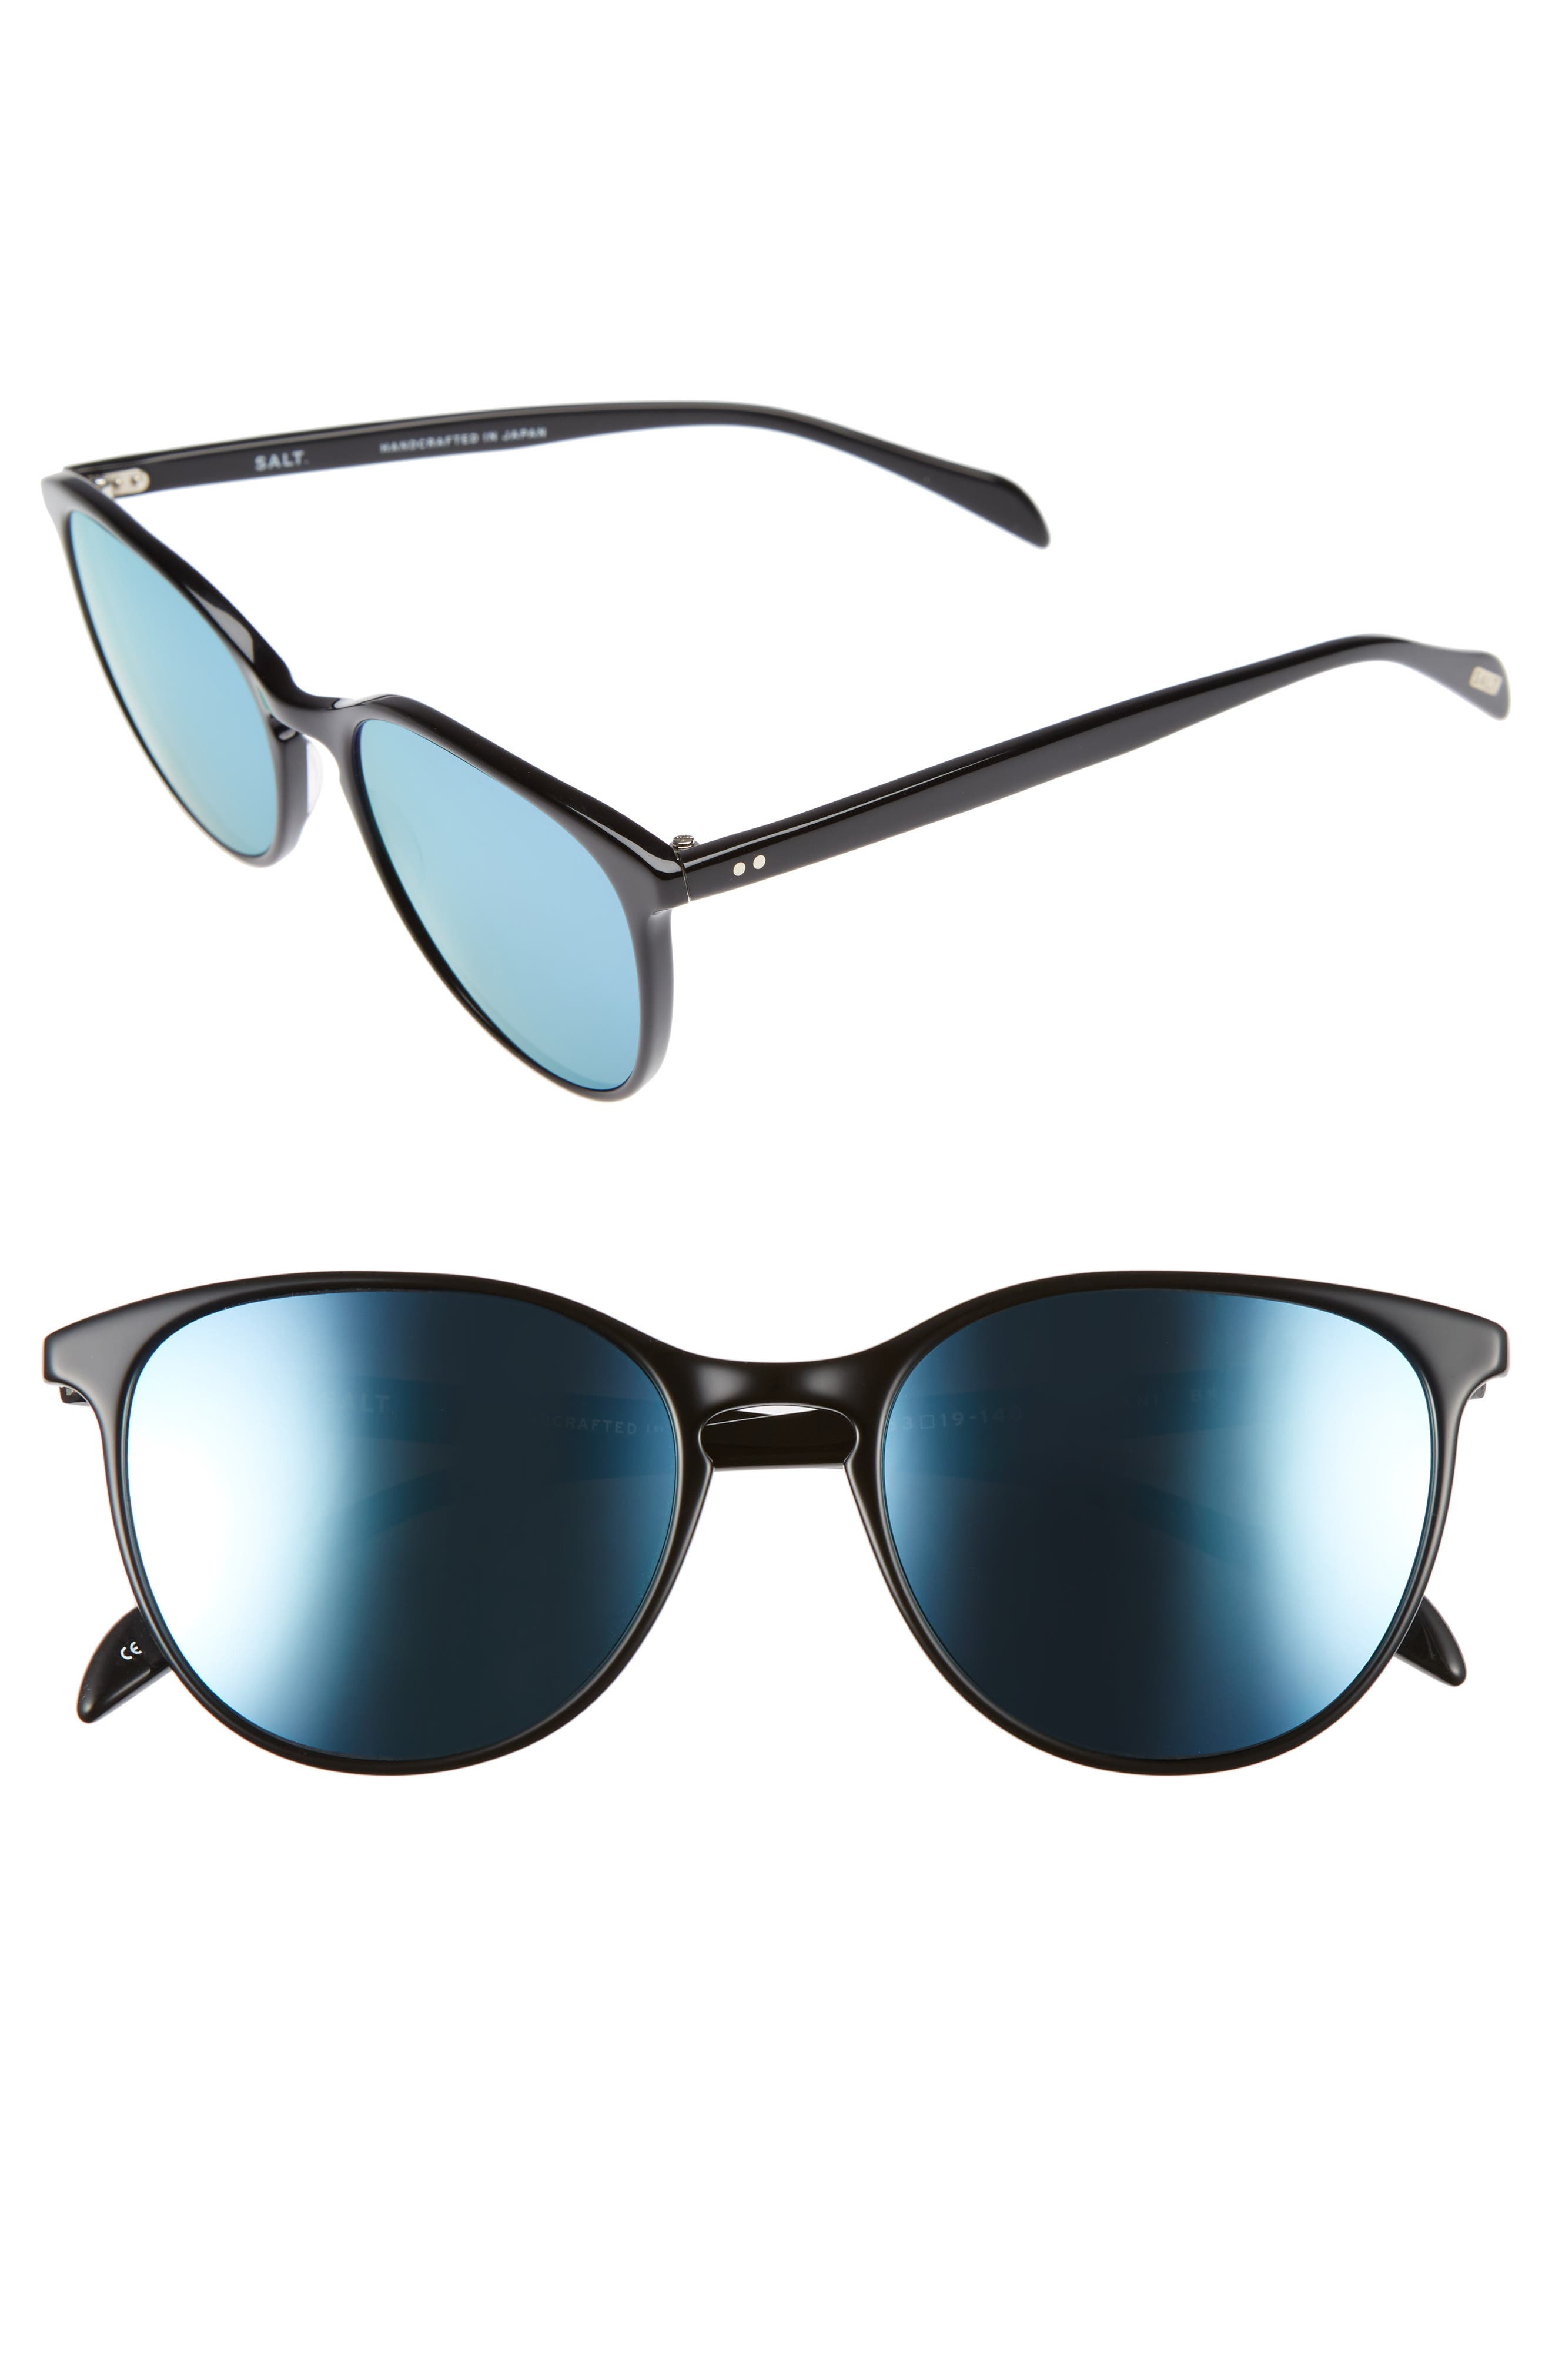 Kiani 53mm Polarized Retro Sunglasses,                             Main thumbnail 1, color,                             001